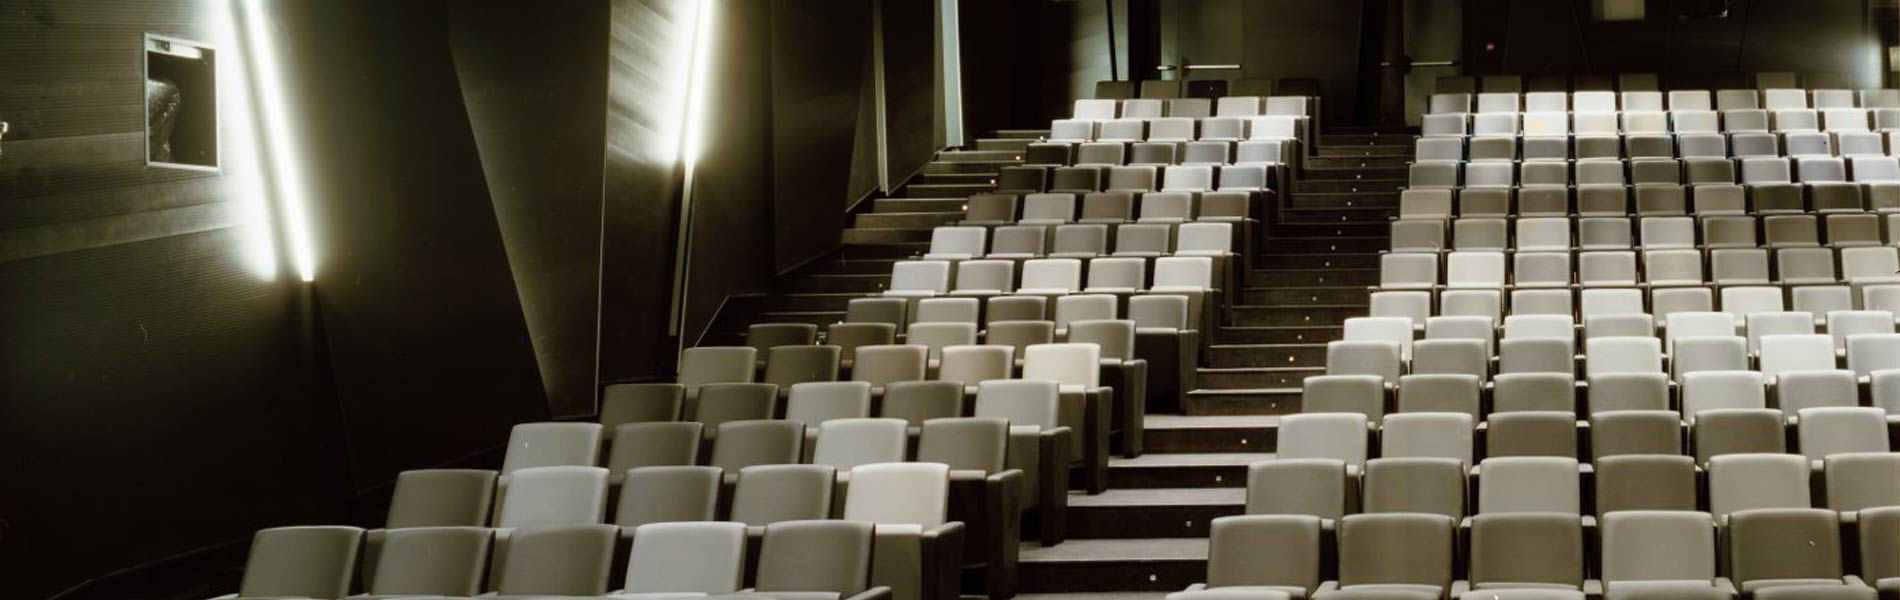 Dimensioni Sala Conferenze 100 Posti.Aresline Comfort Experiences Tempo Plus